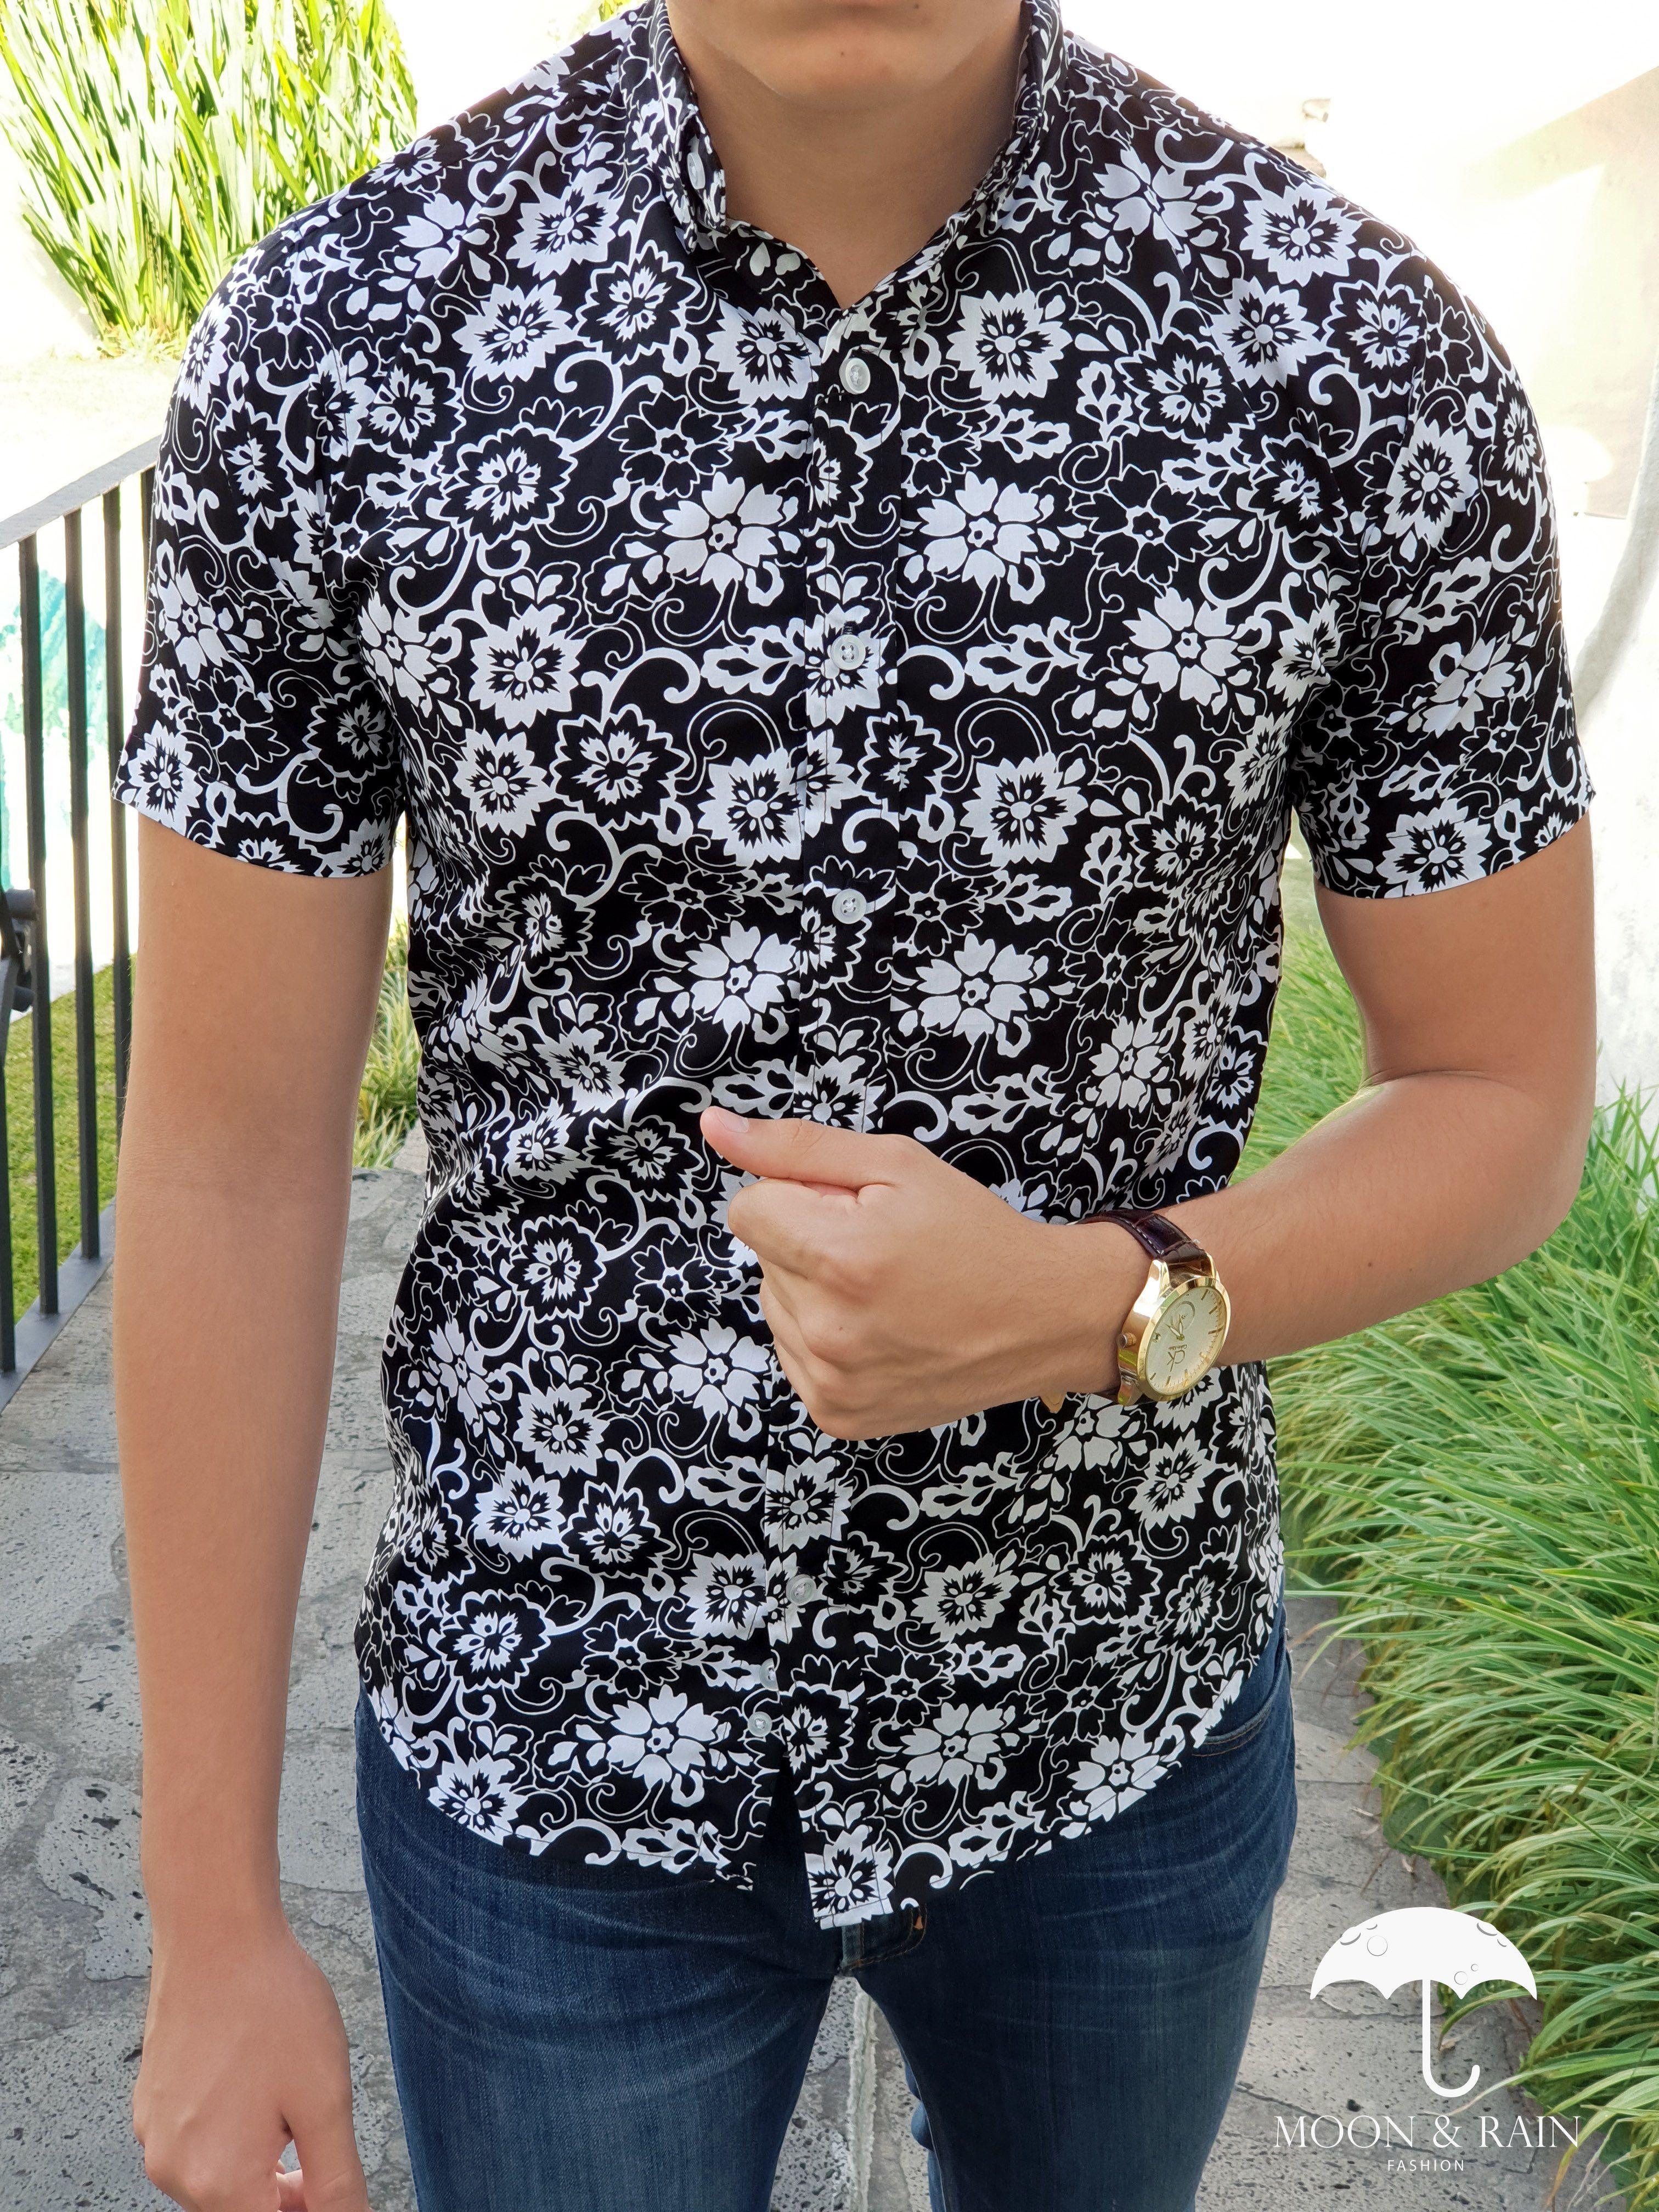 32811d70da9af Outfit para hombre  camisa negra con flores blancas en manga corta y jeans  de mezclilla